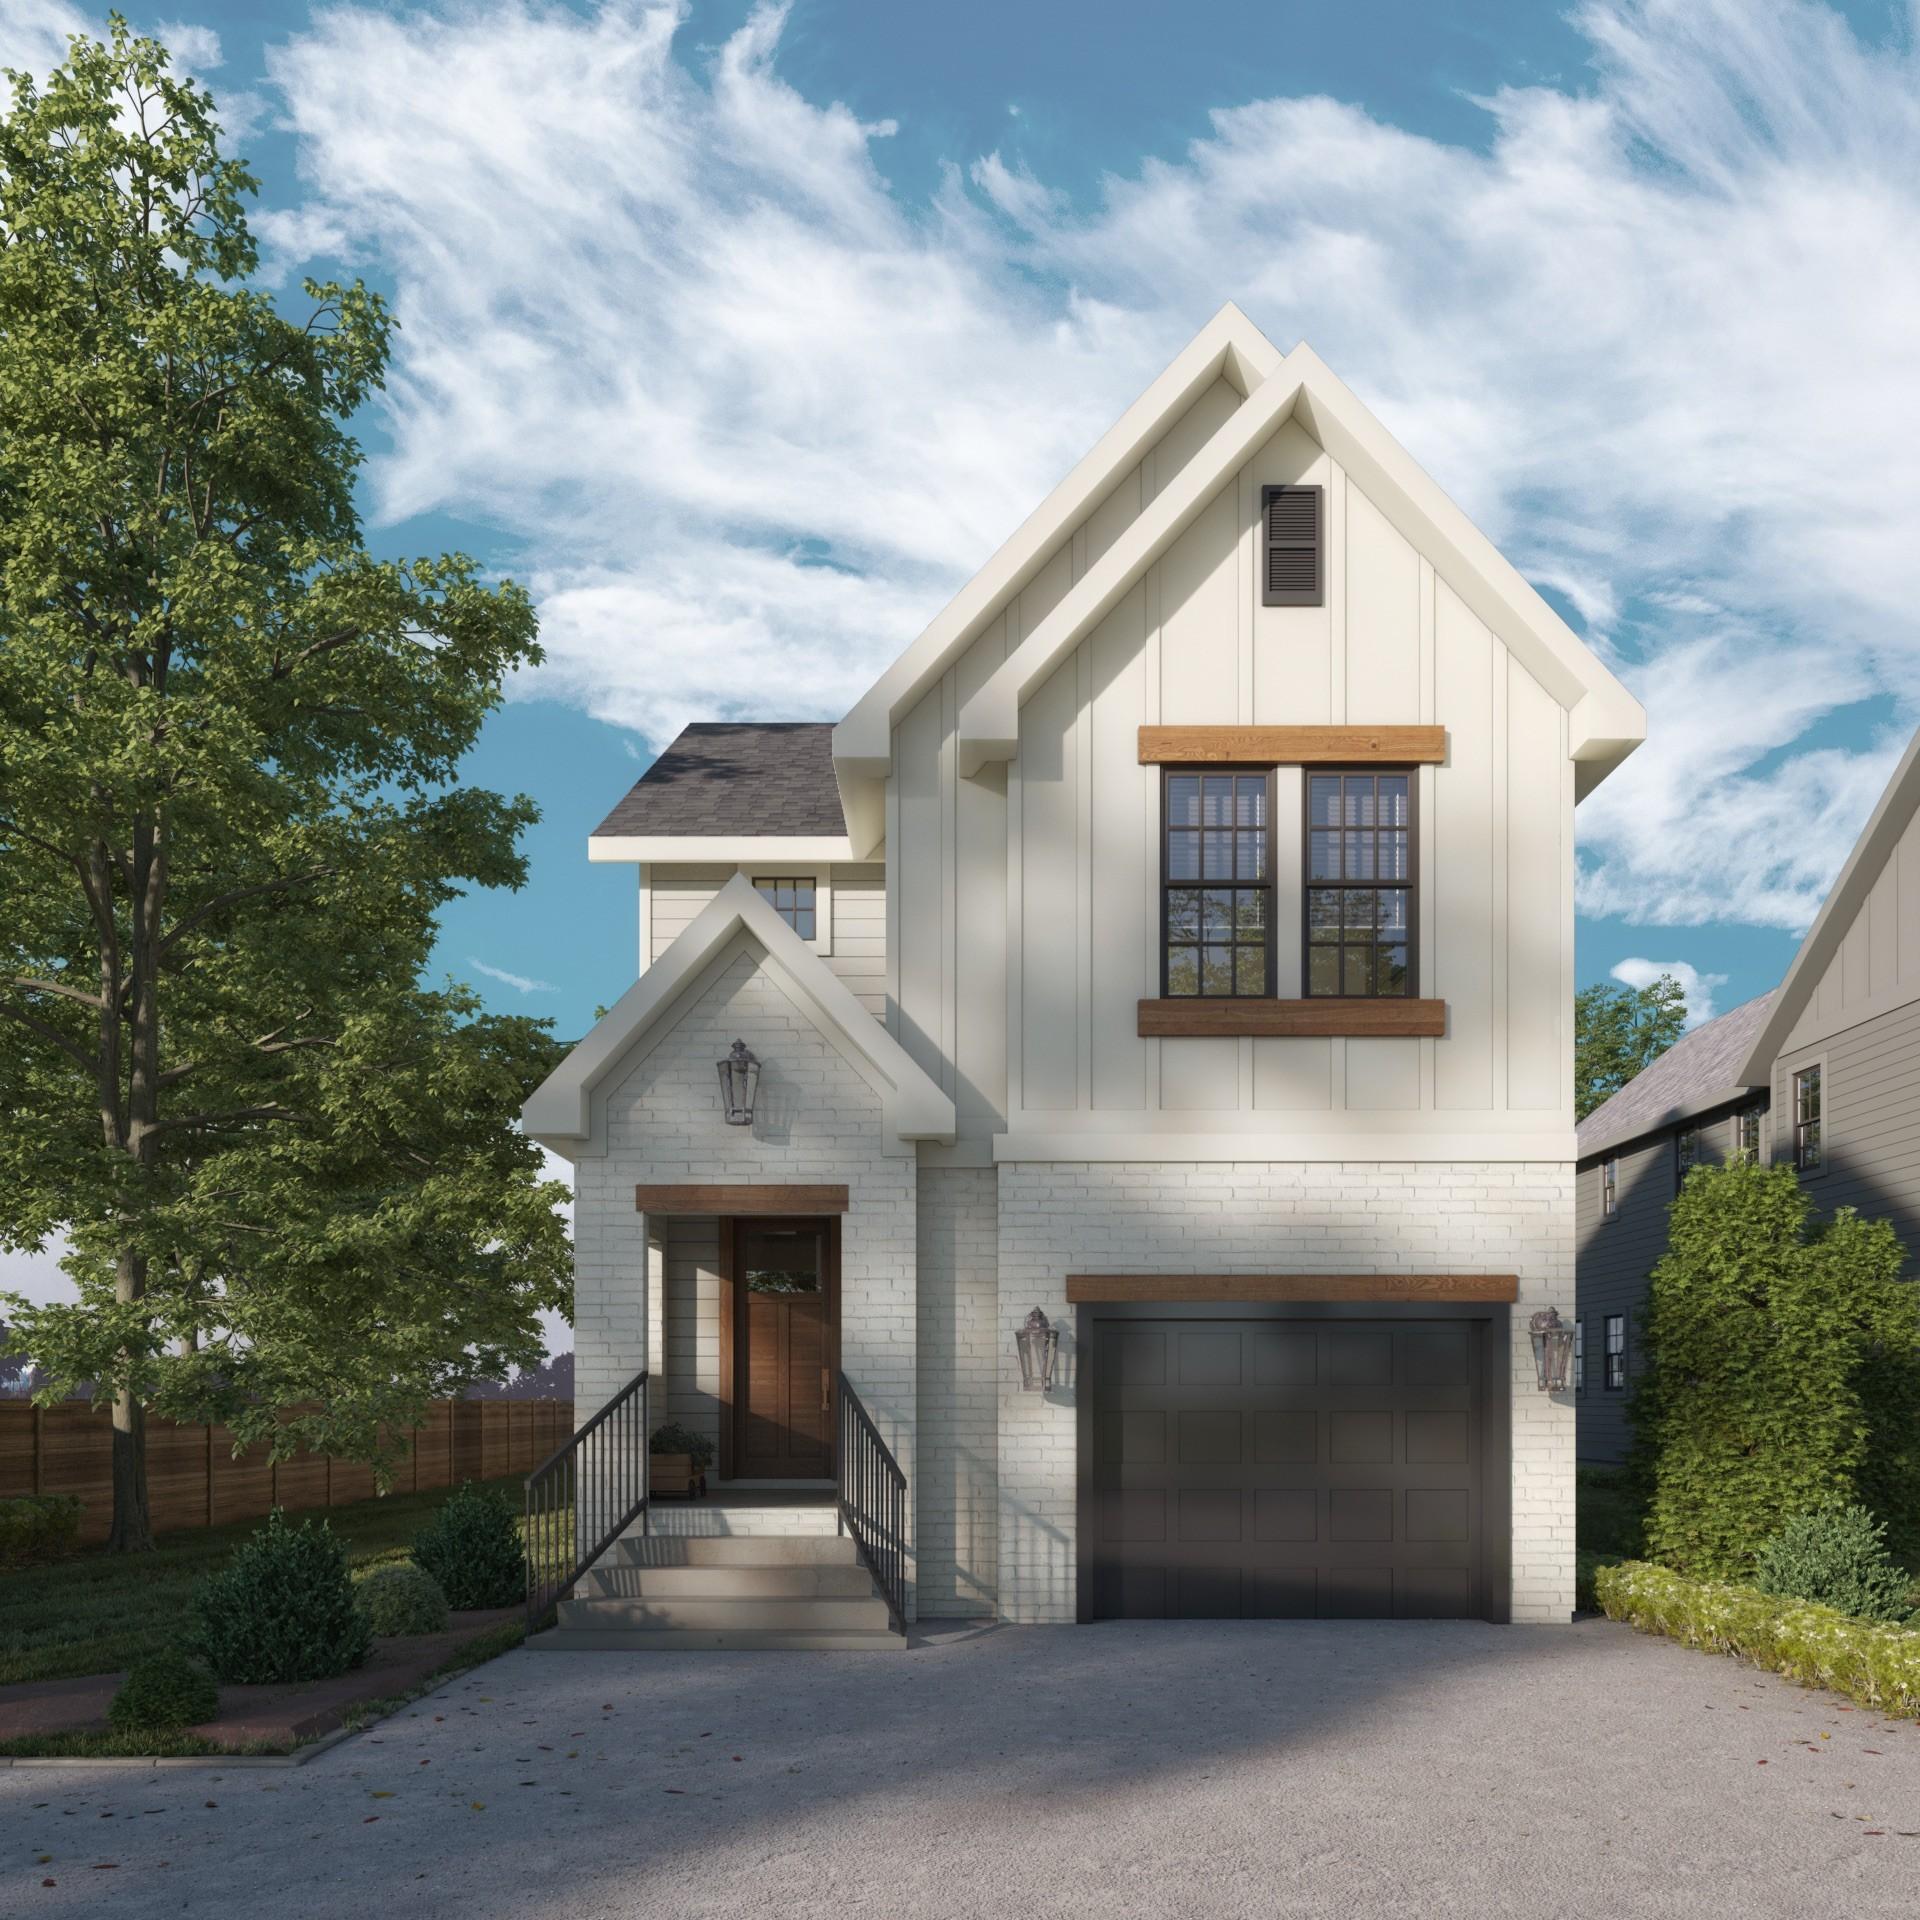 2428 Chapman Dr #A Property Photo - Nashville, TN real estate listing